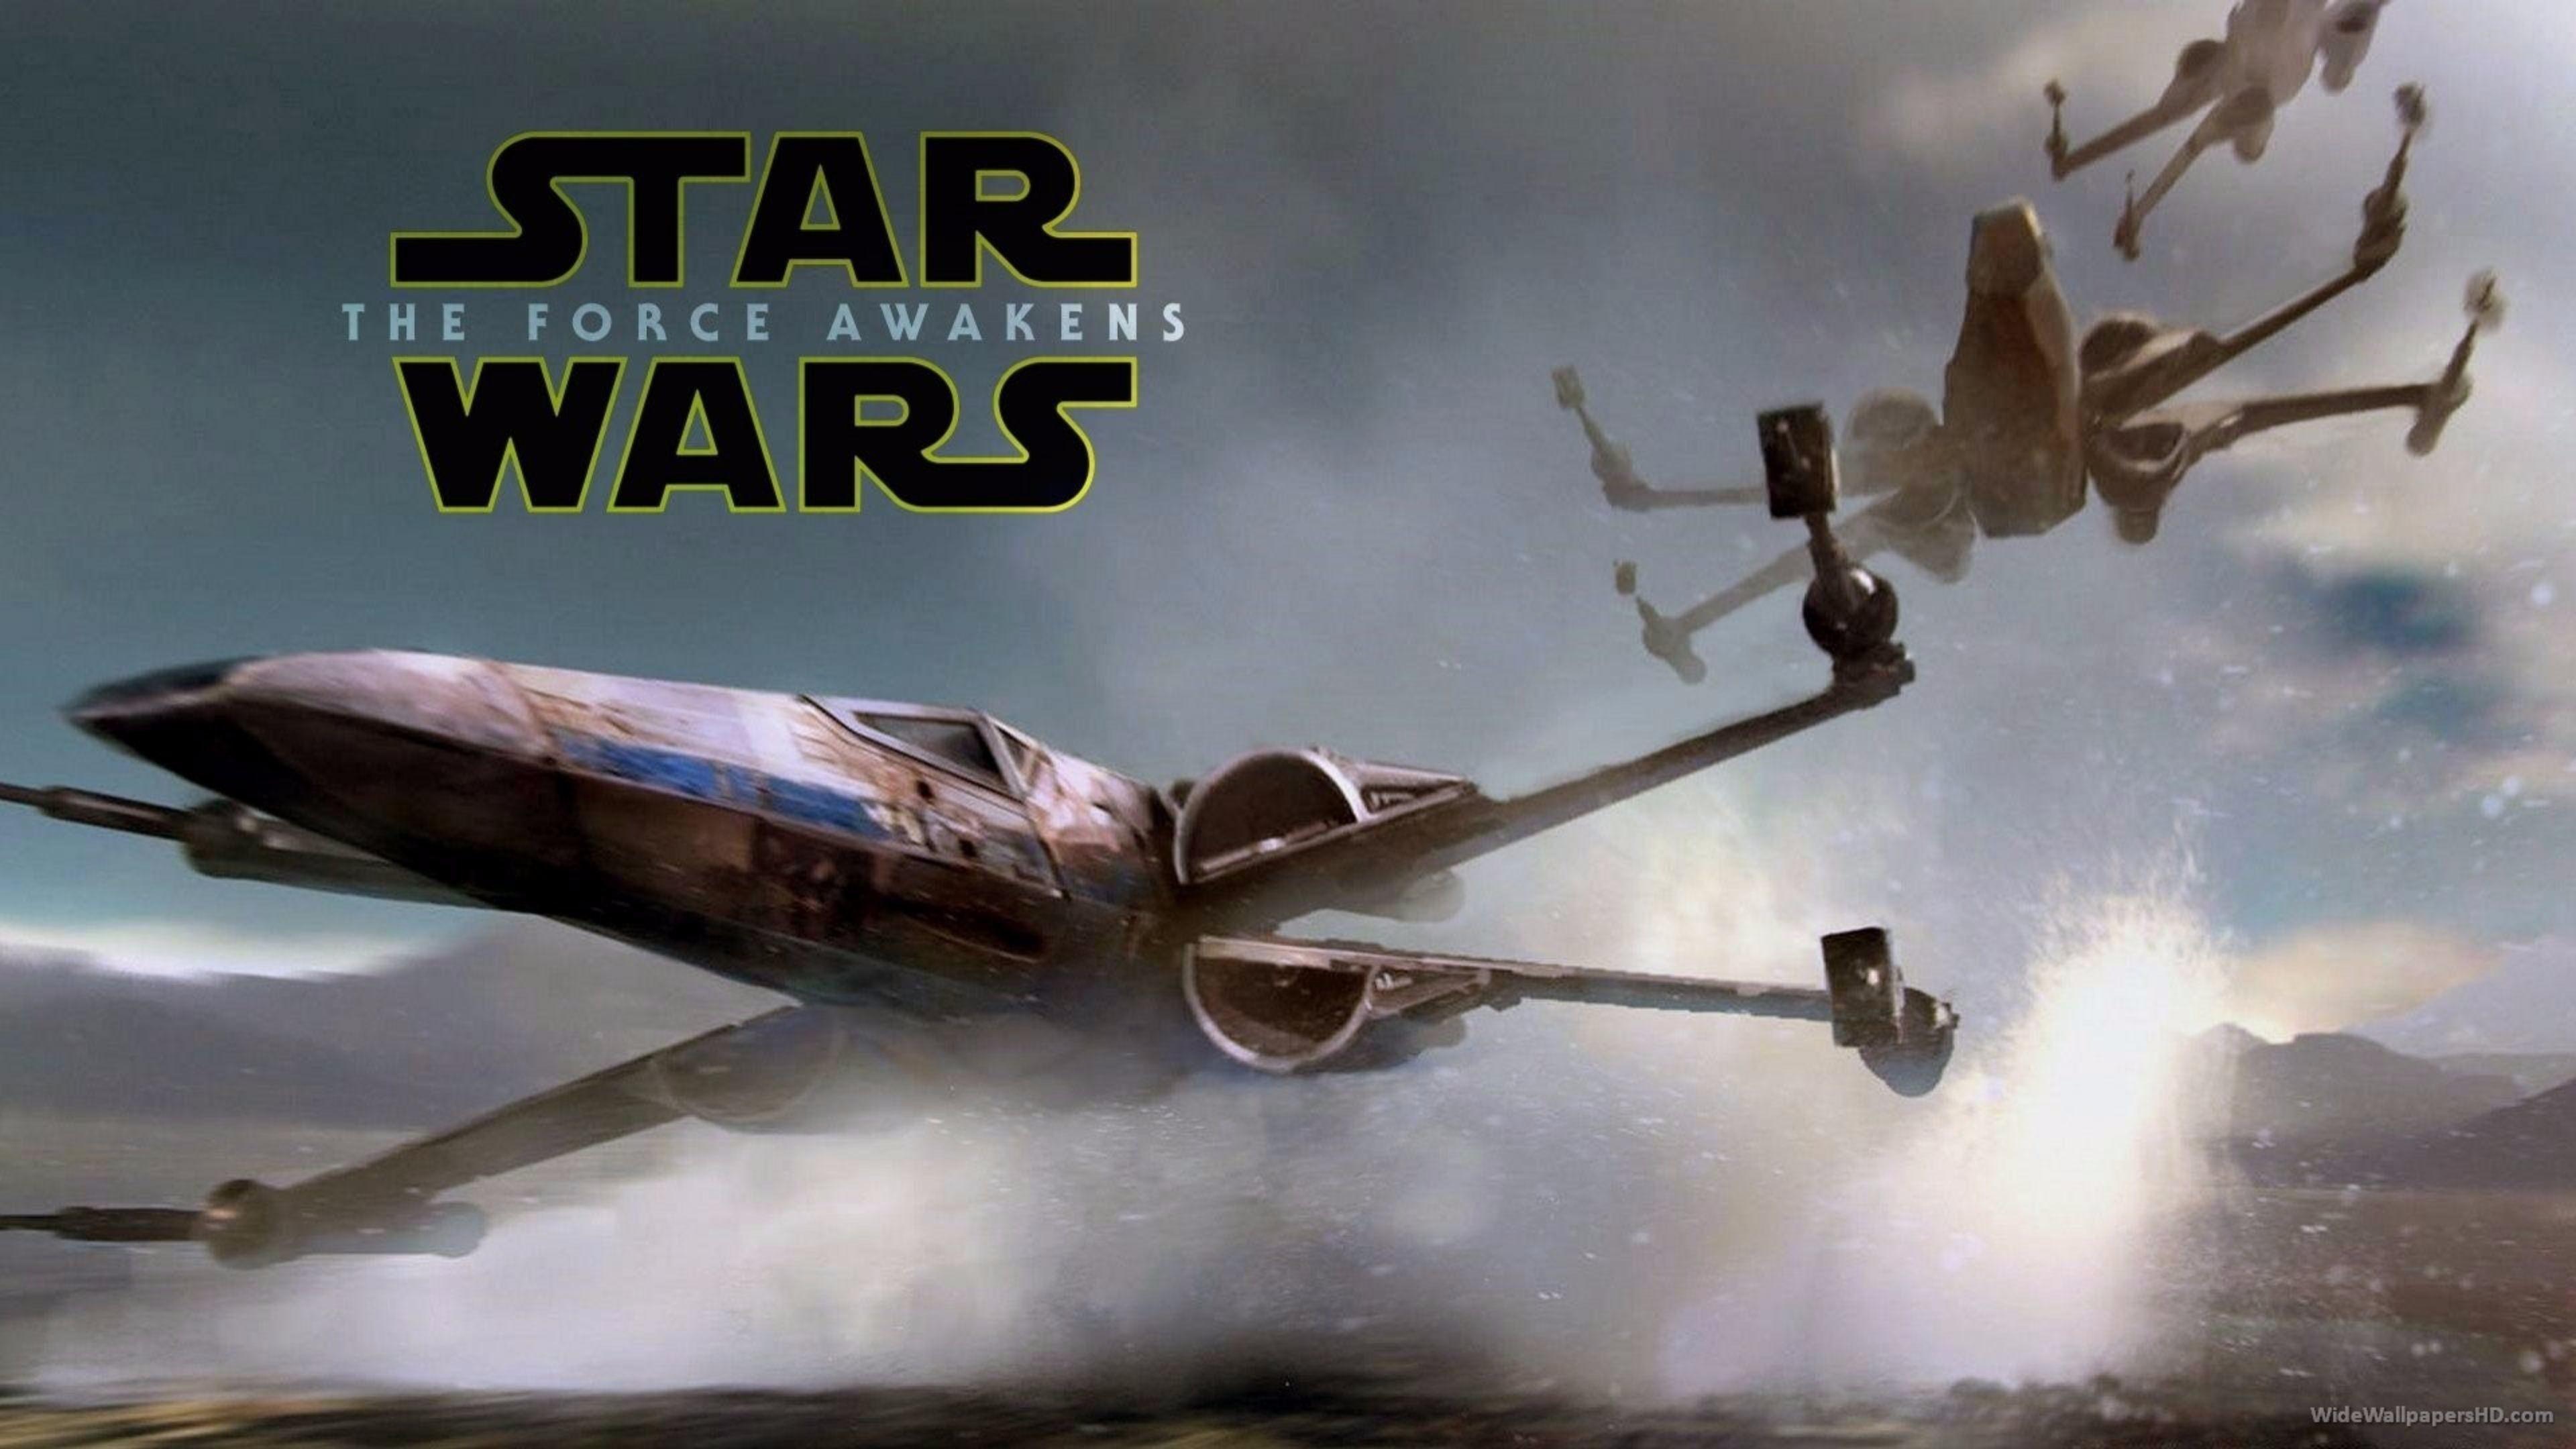 Download Free Star Wars The Force Awakens 4K Wallpaper